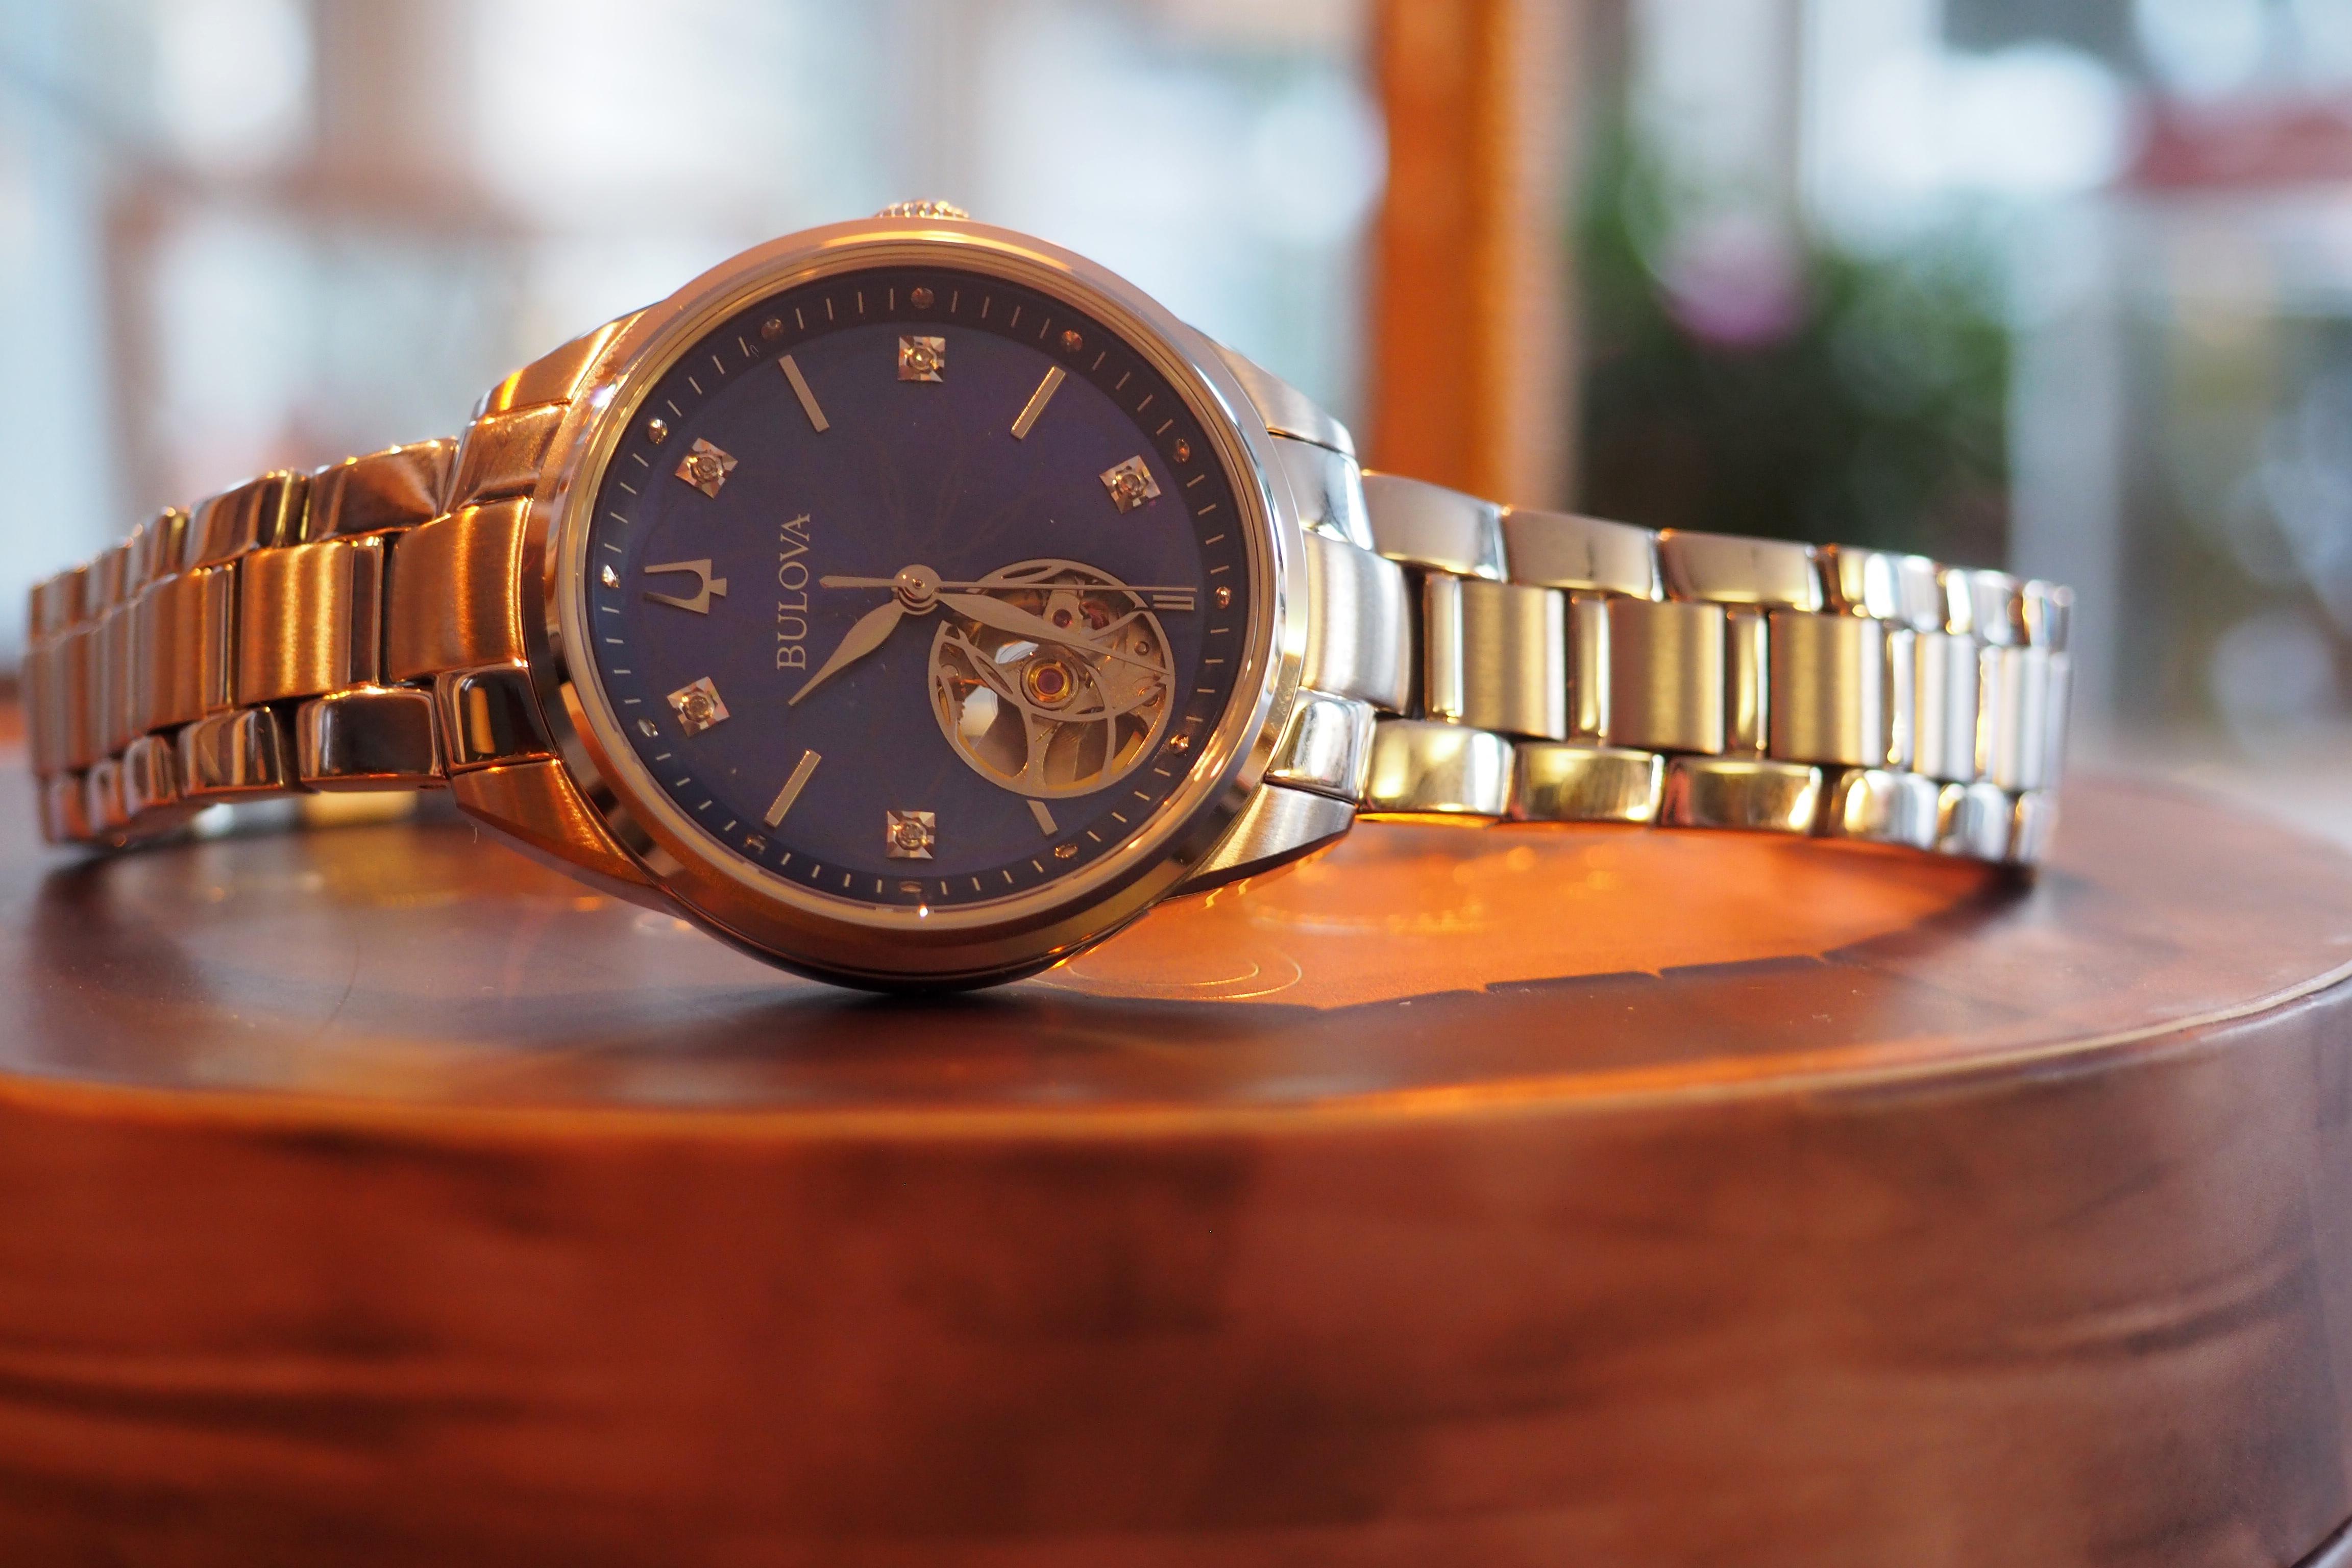 Bulova 96P191 Women's Classic Automatic Watch Review